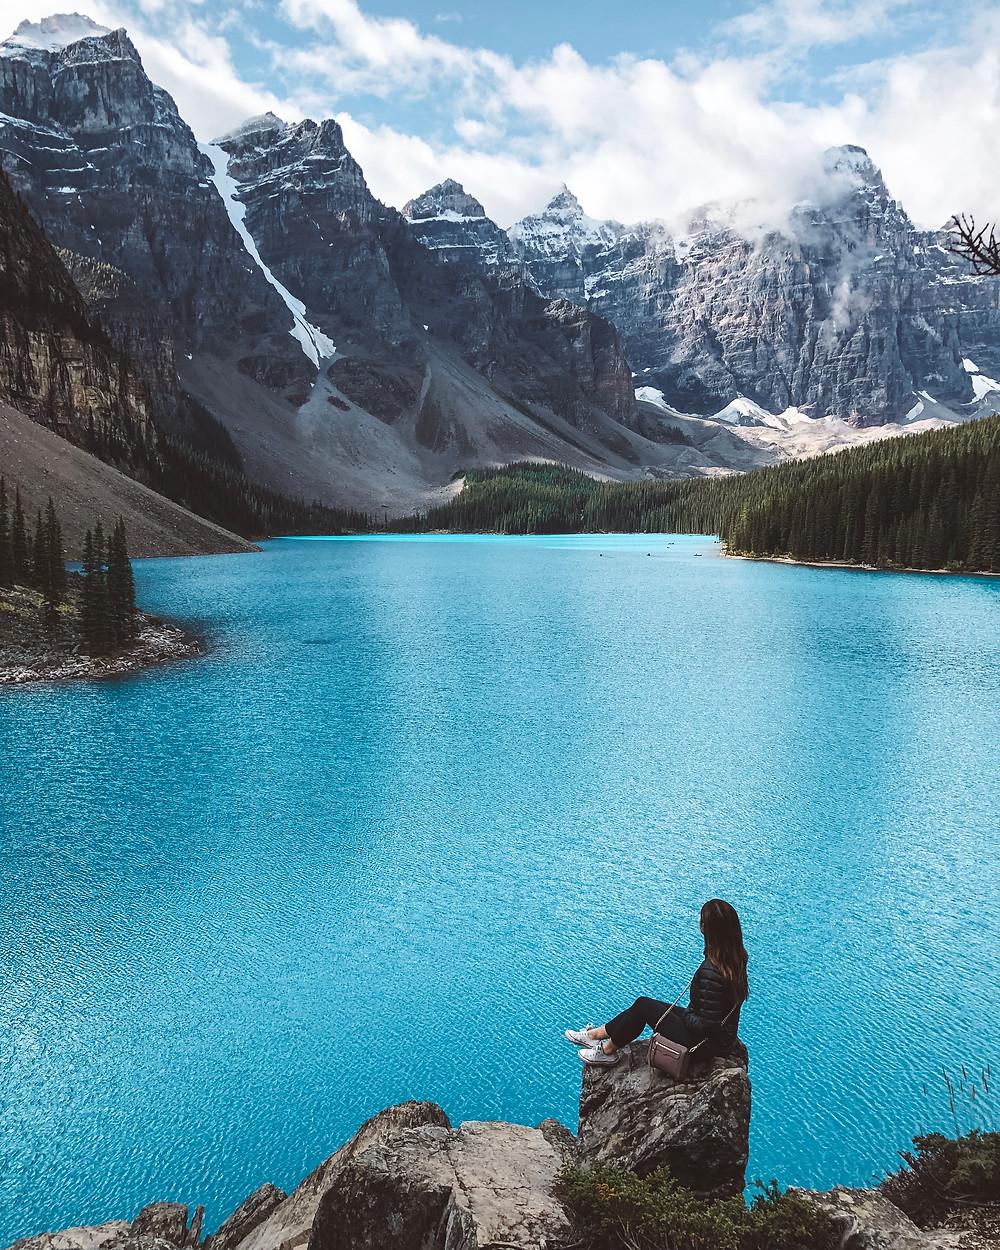 moraine lake alberta canada turquoise blue